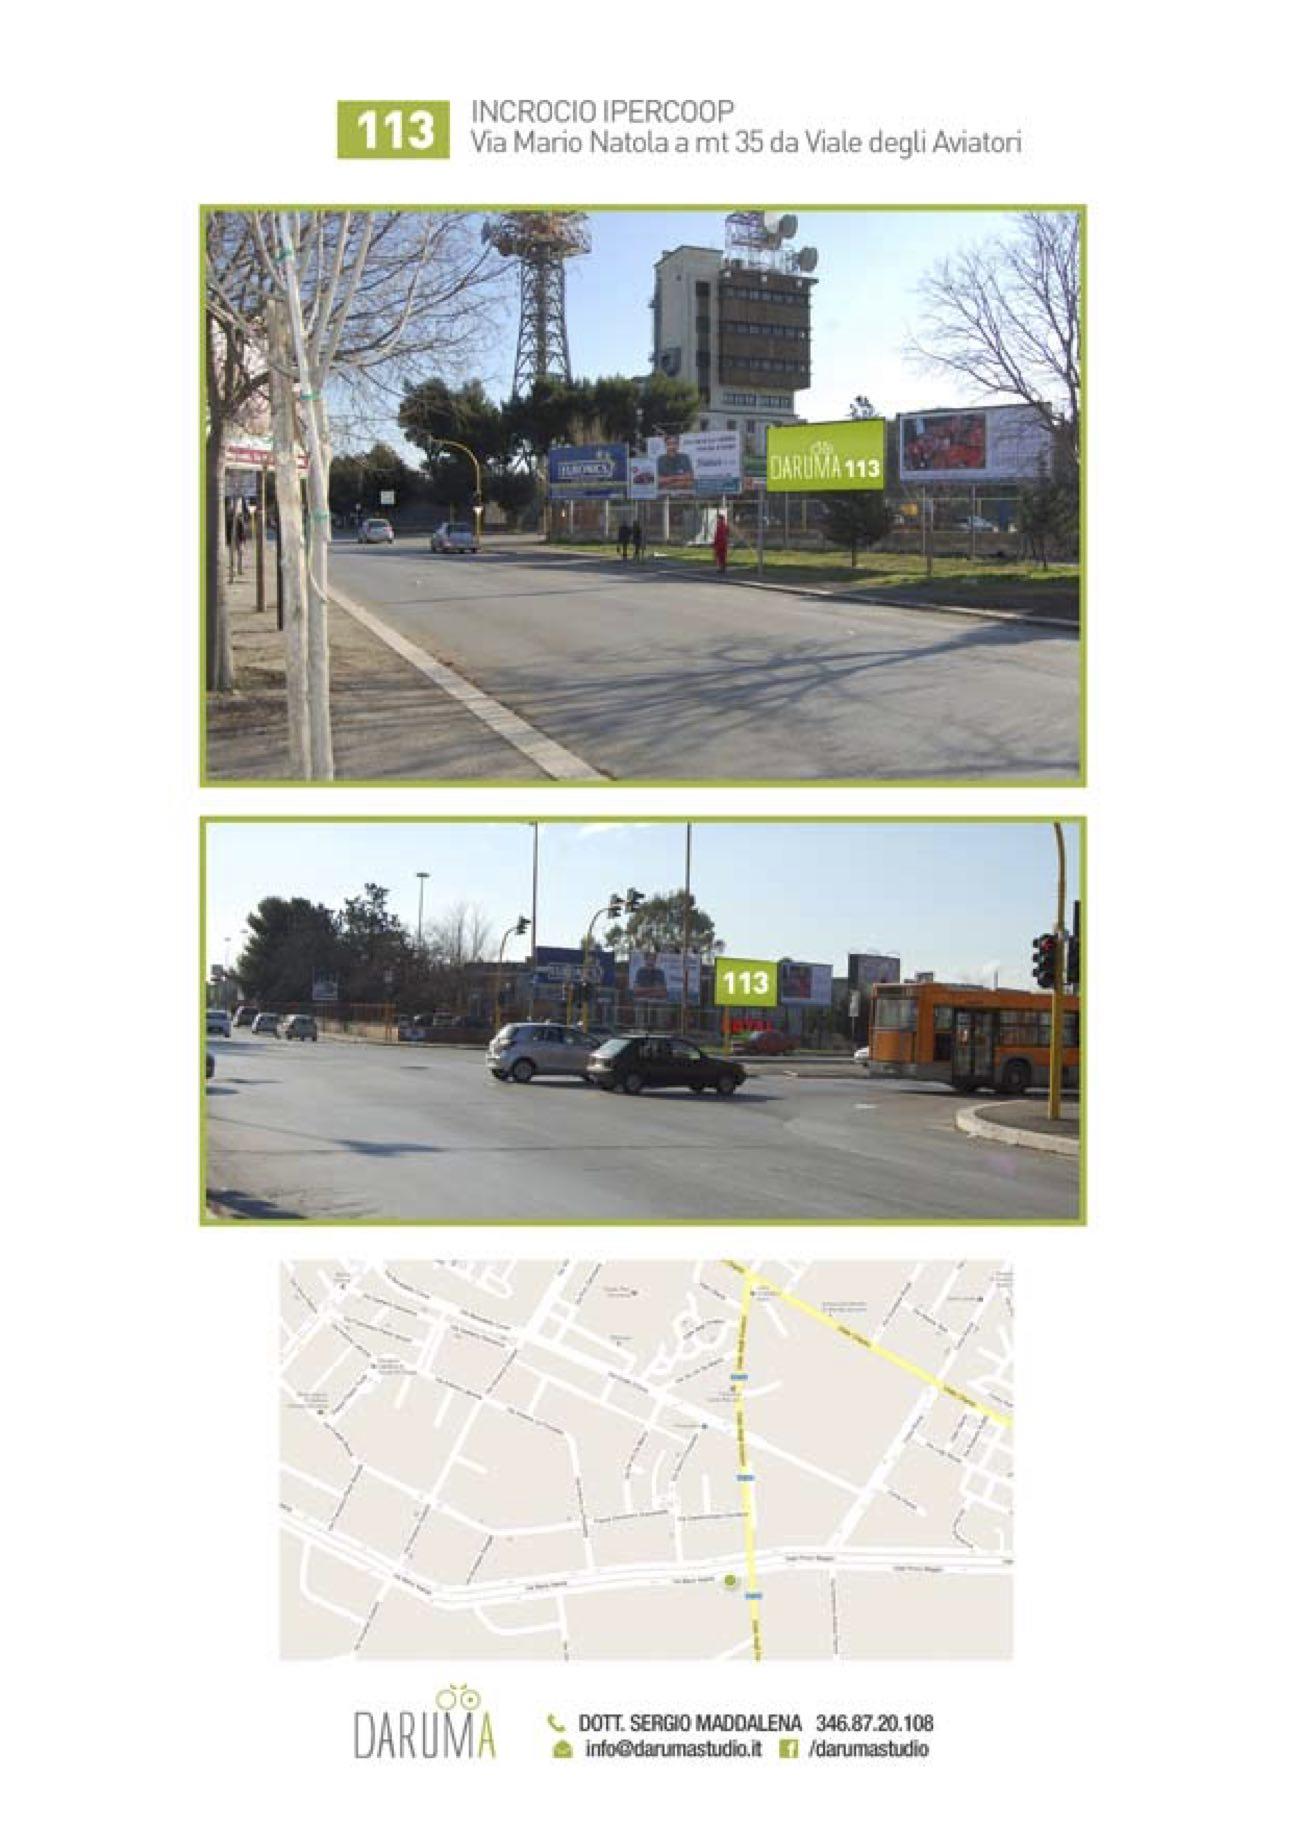 6x3 Monofacciale Via Natola, incrocio Ipercoop